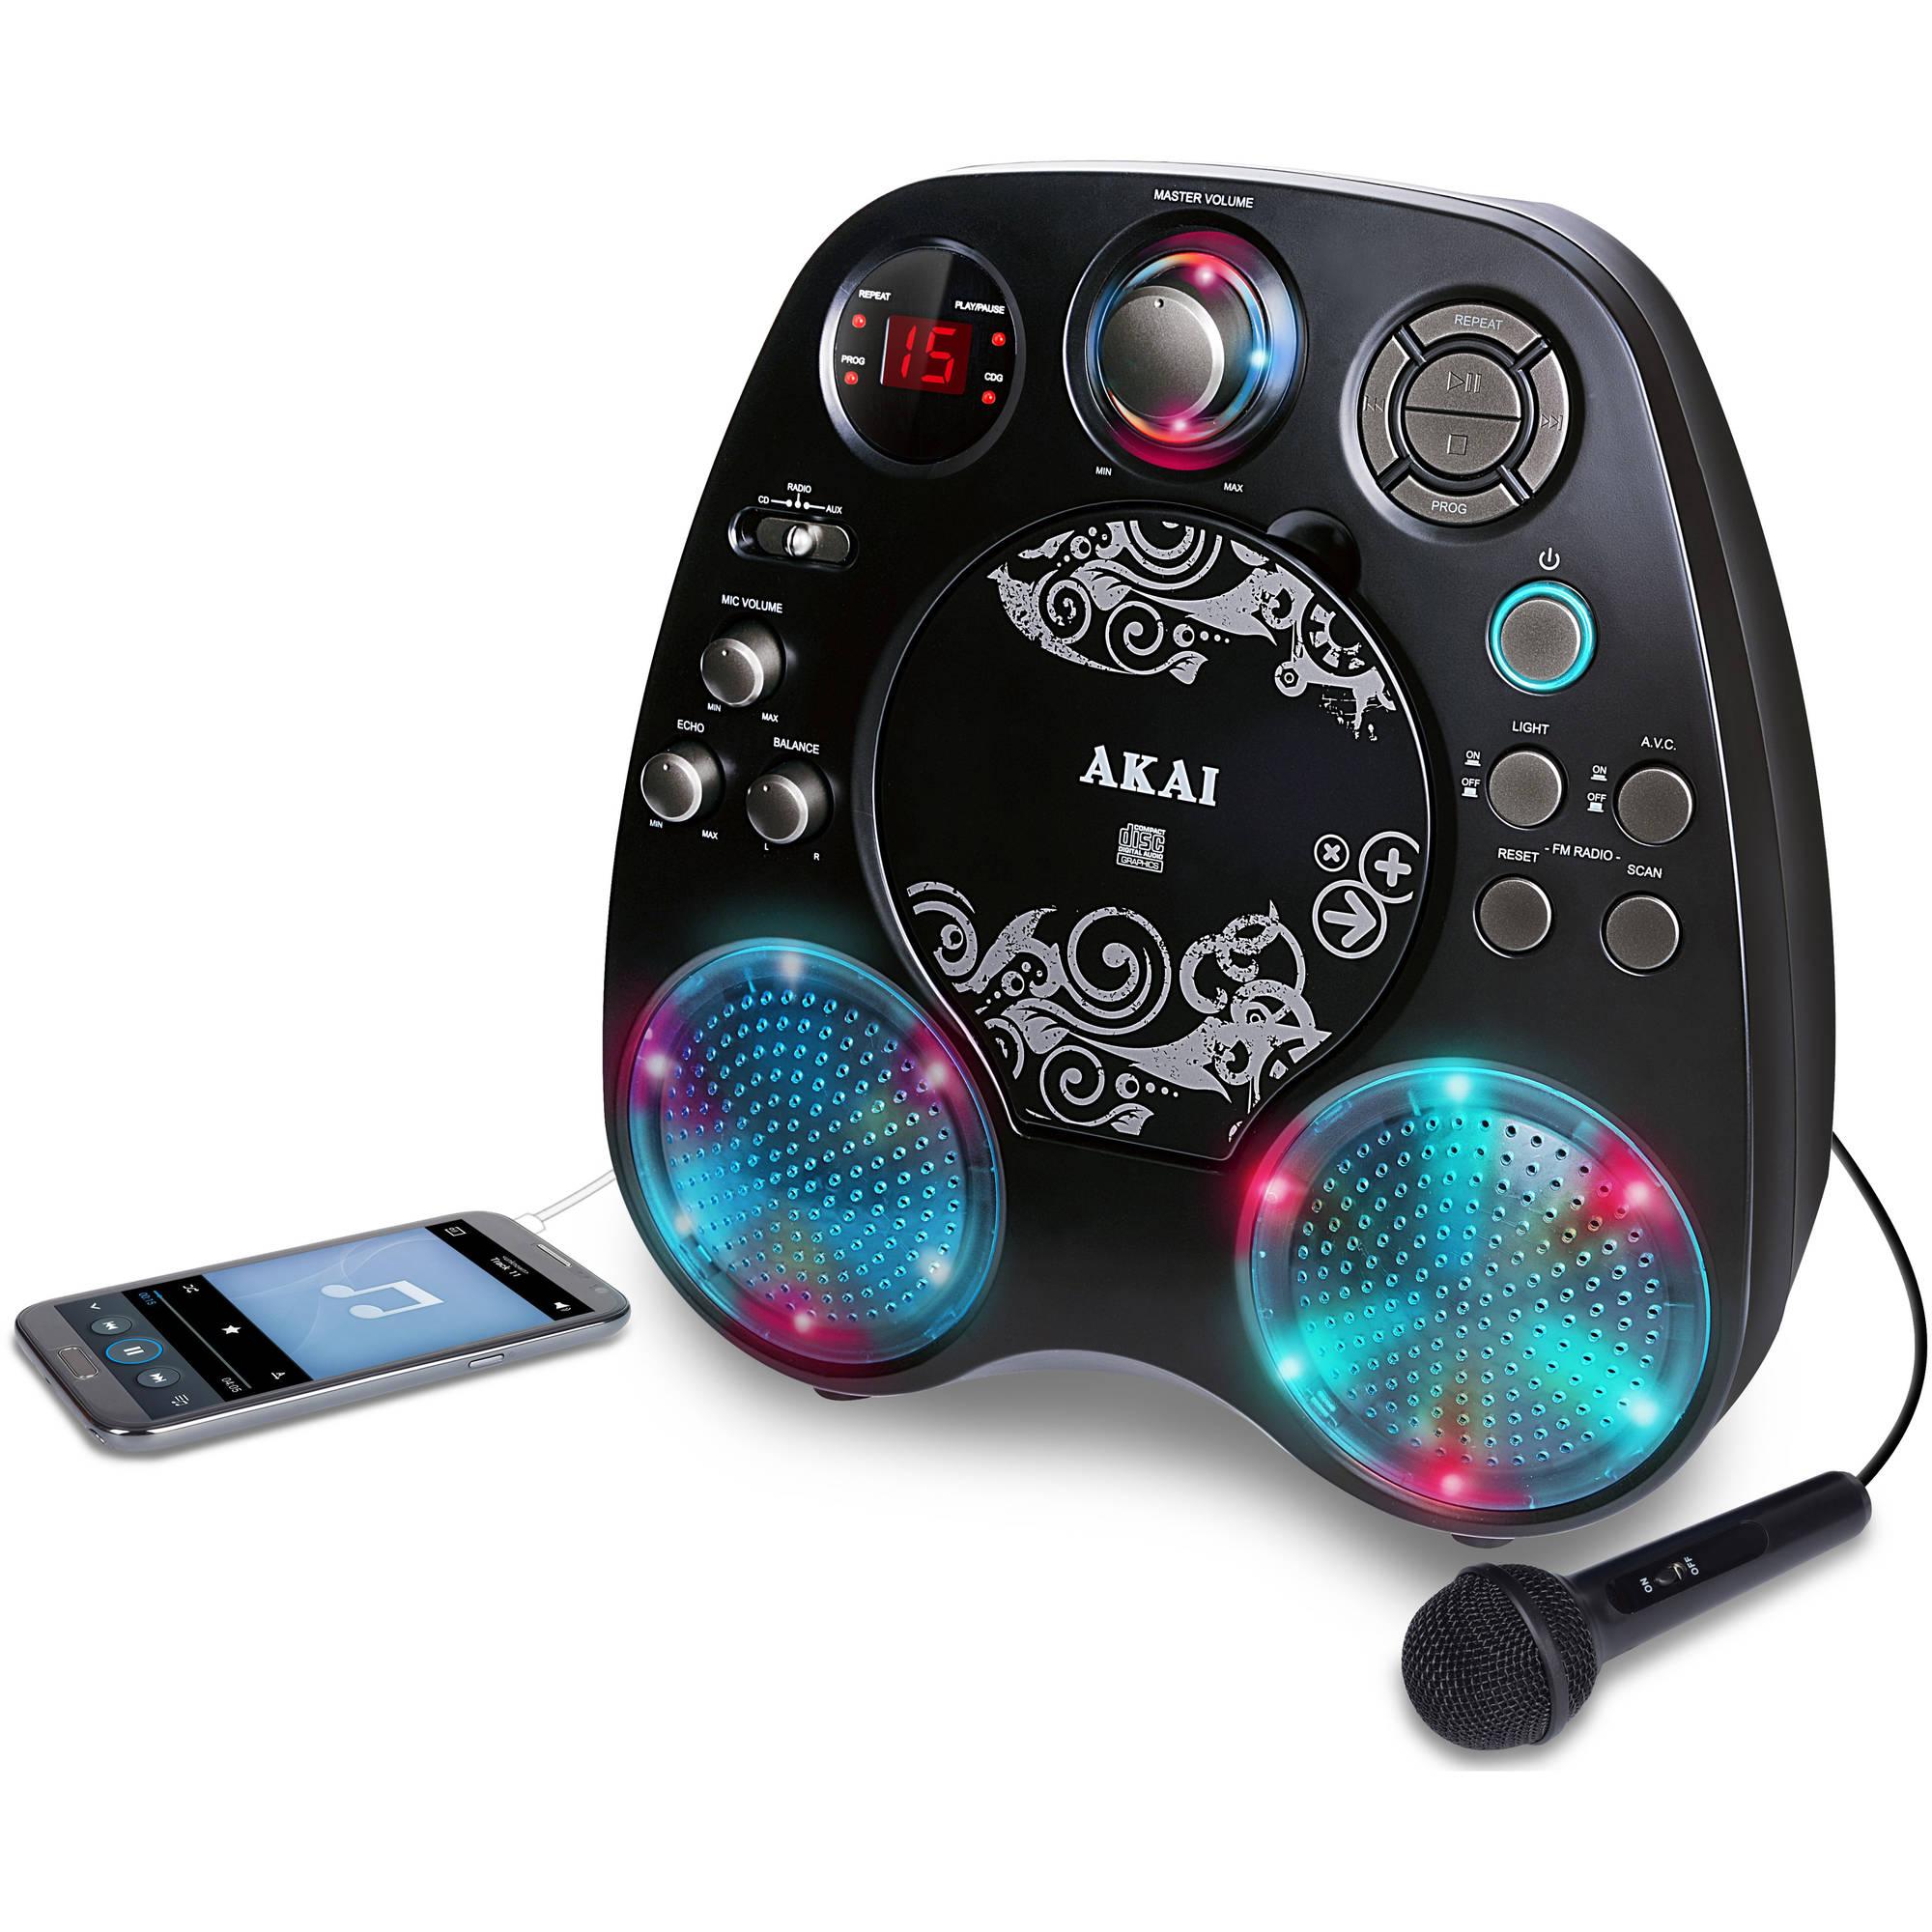 Akai KS390 Karaoke Player with Light Effects